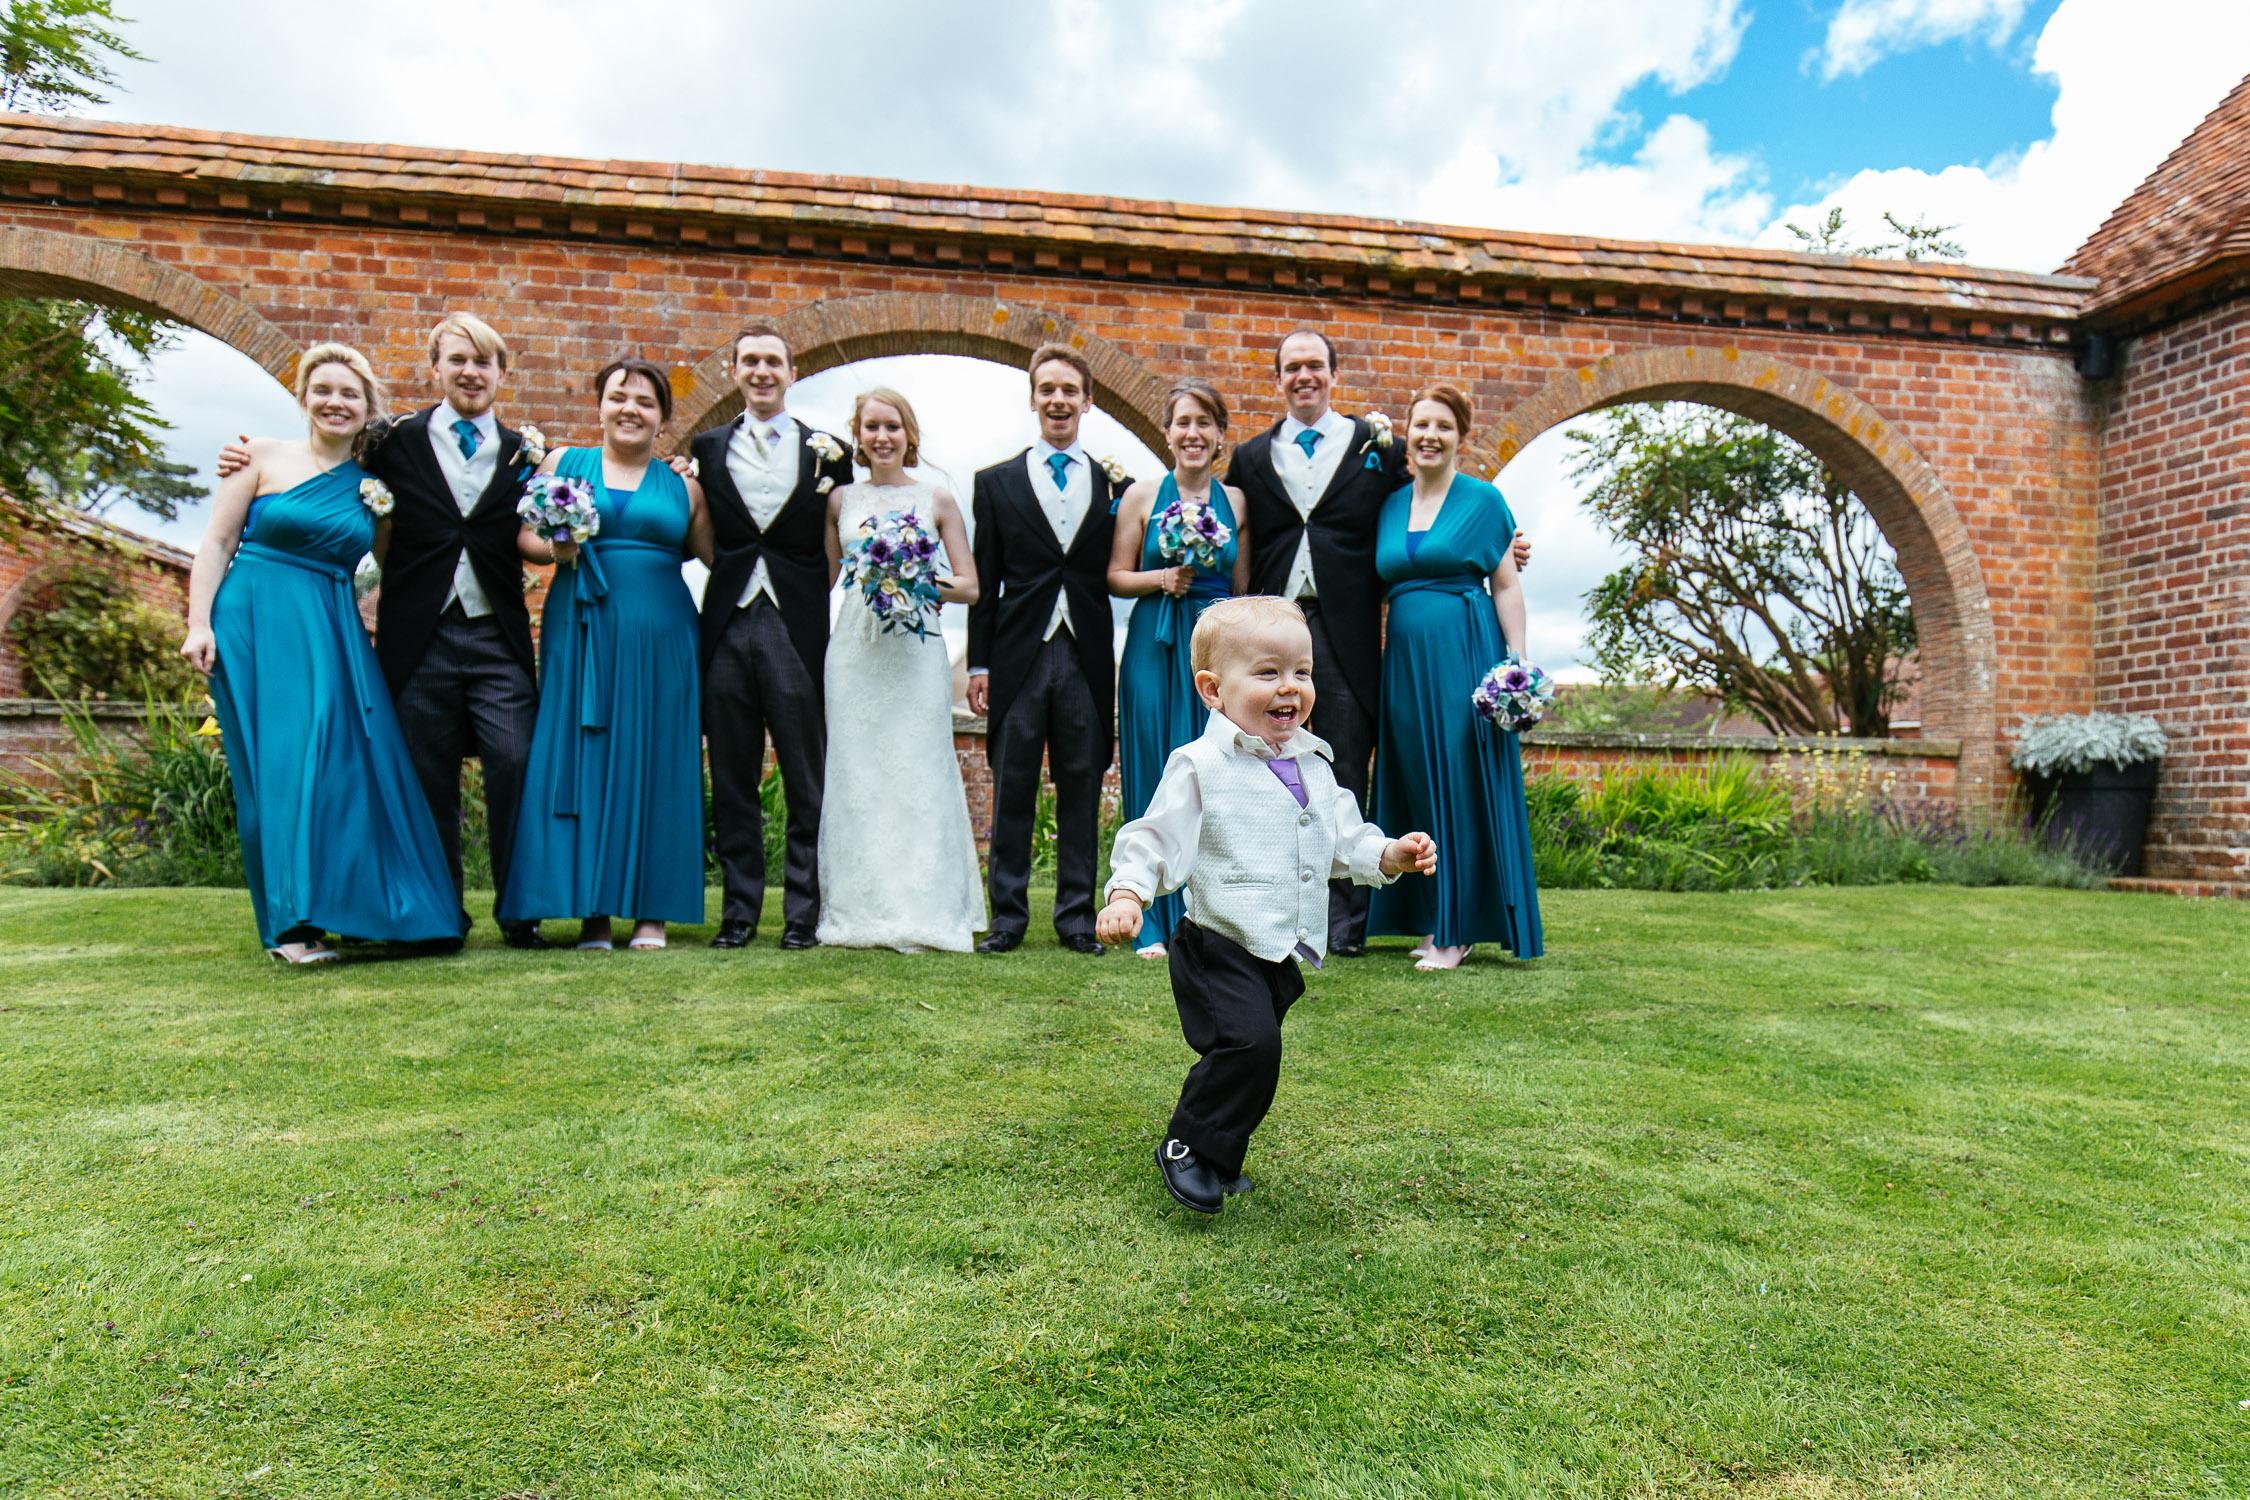 Lizi-and-Mark-Wedding-Highlights-52.jpg